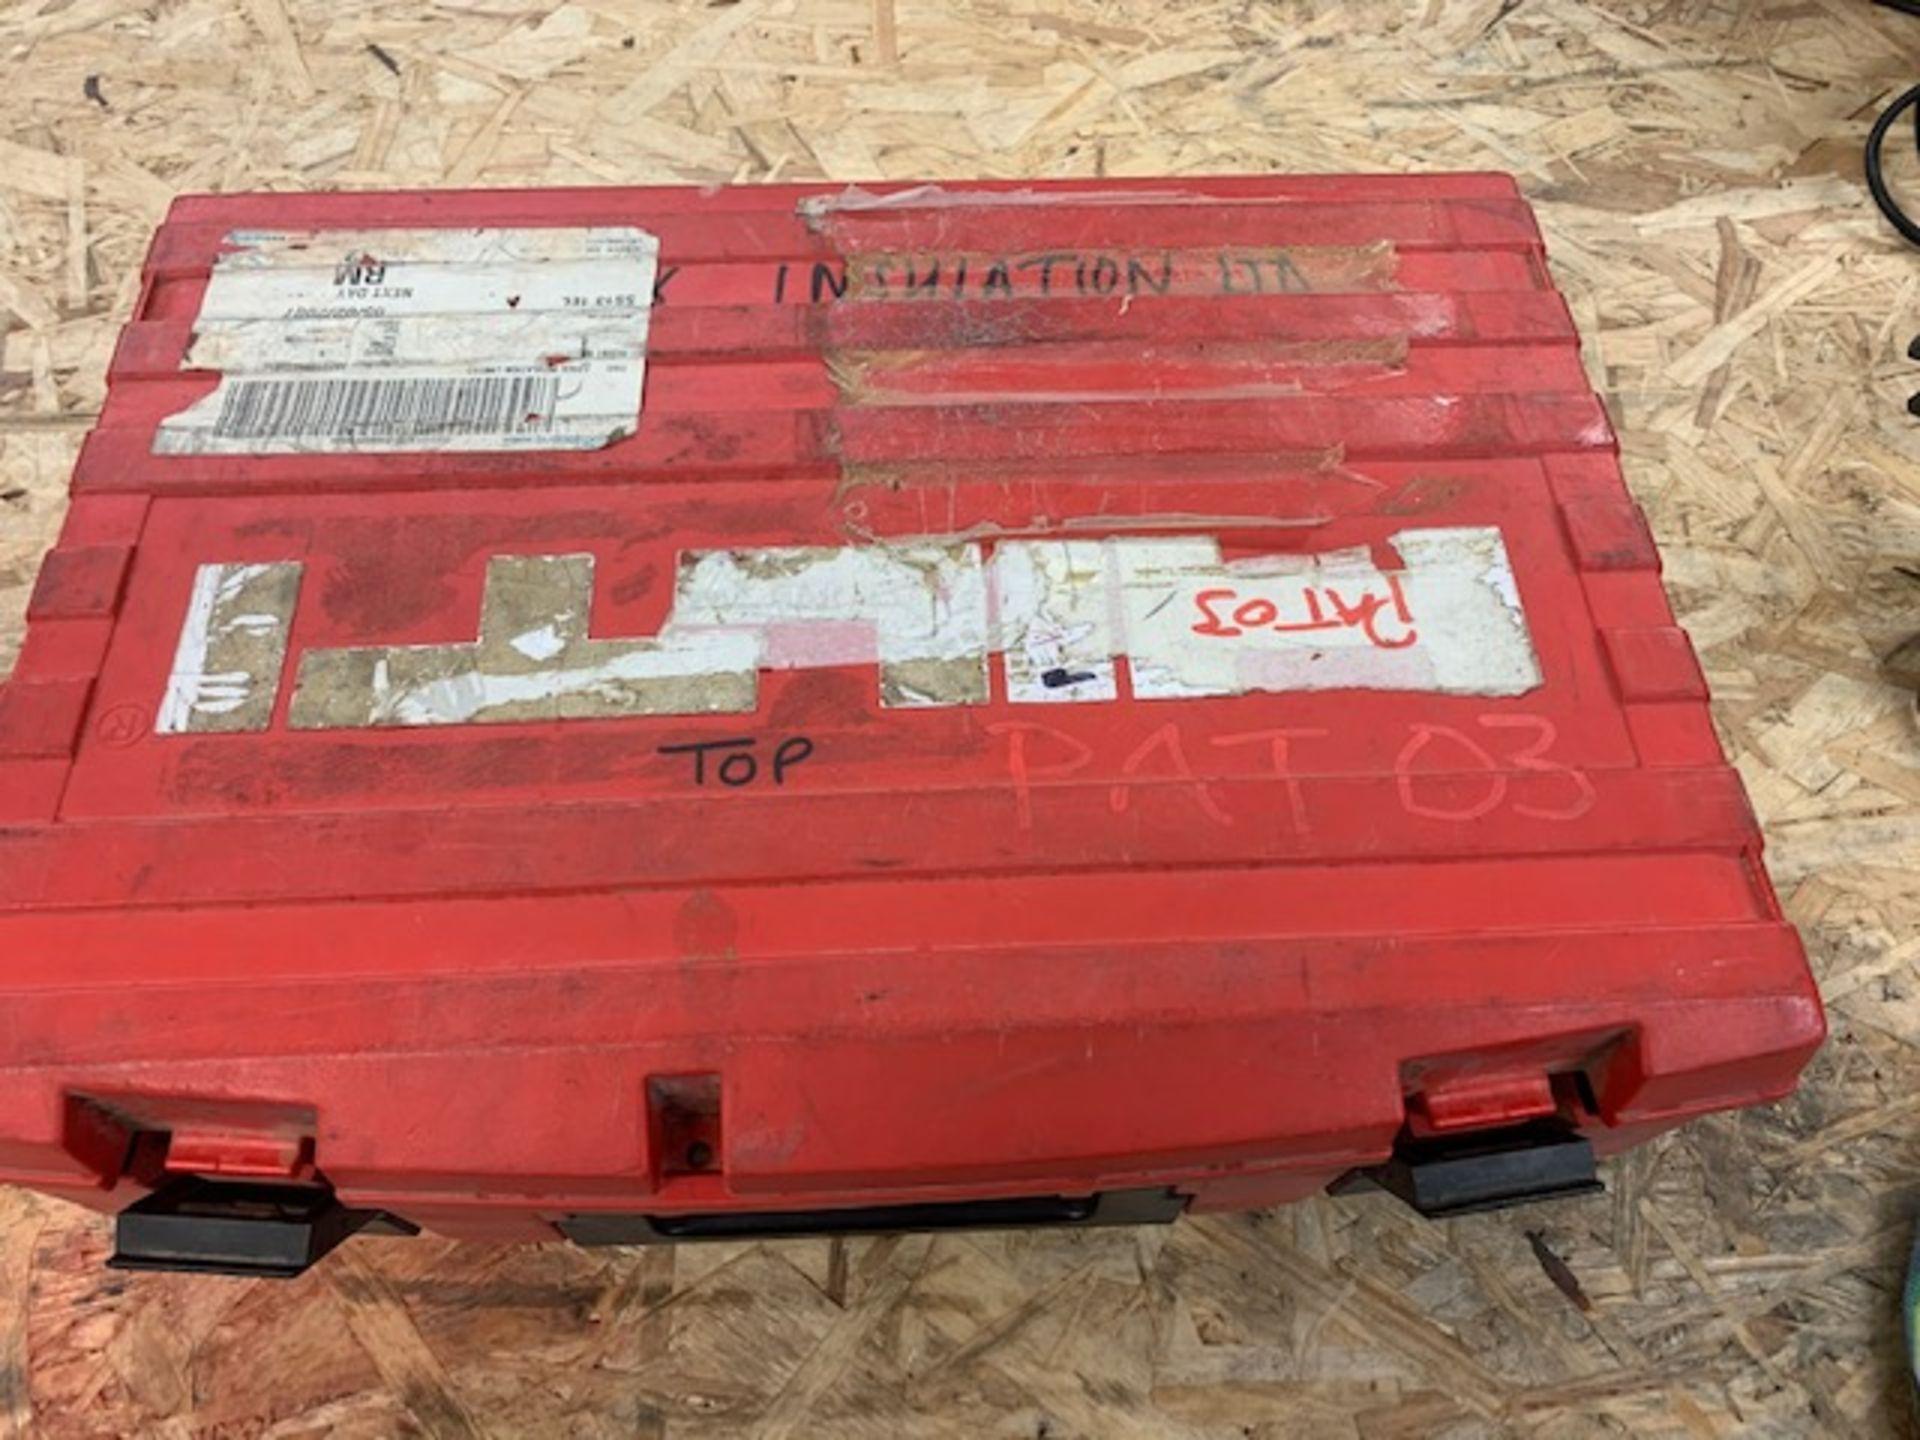 Los 84 - Hilti DXA40 Cartridge hammer nail gun